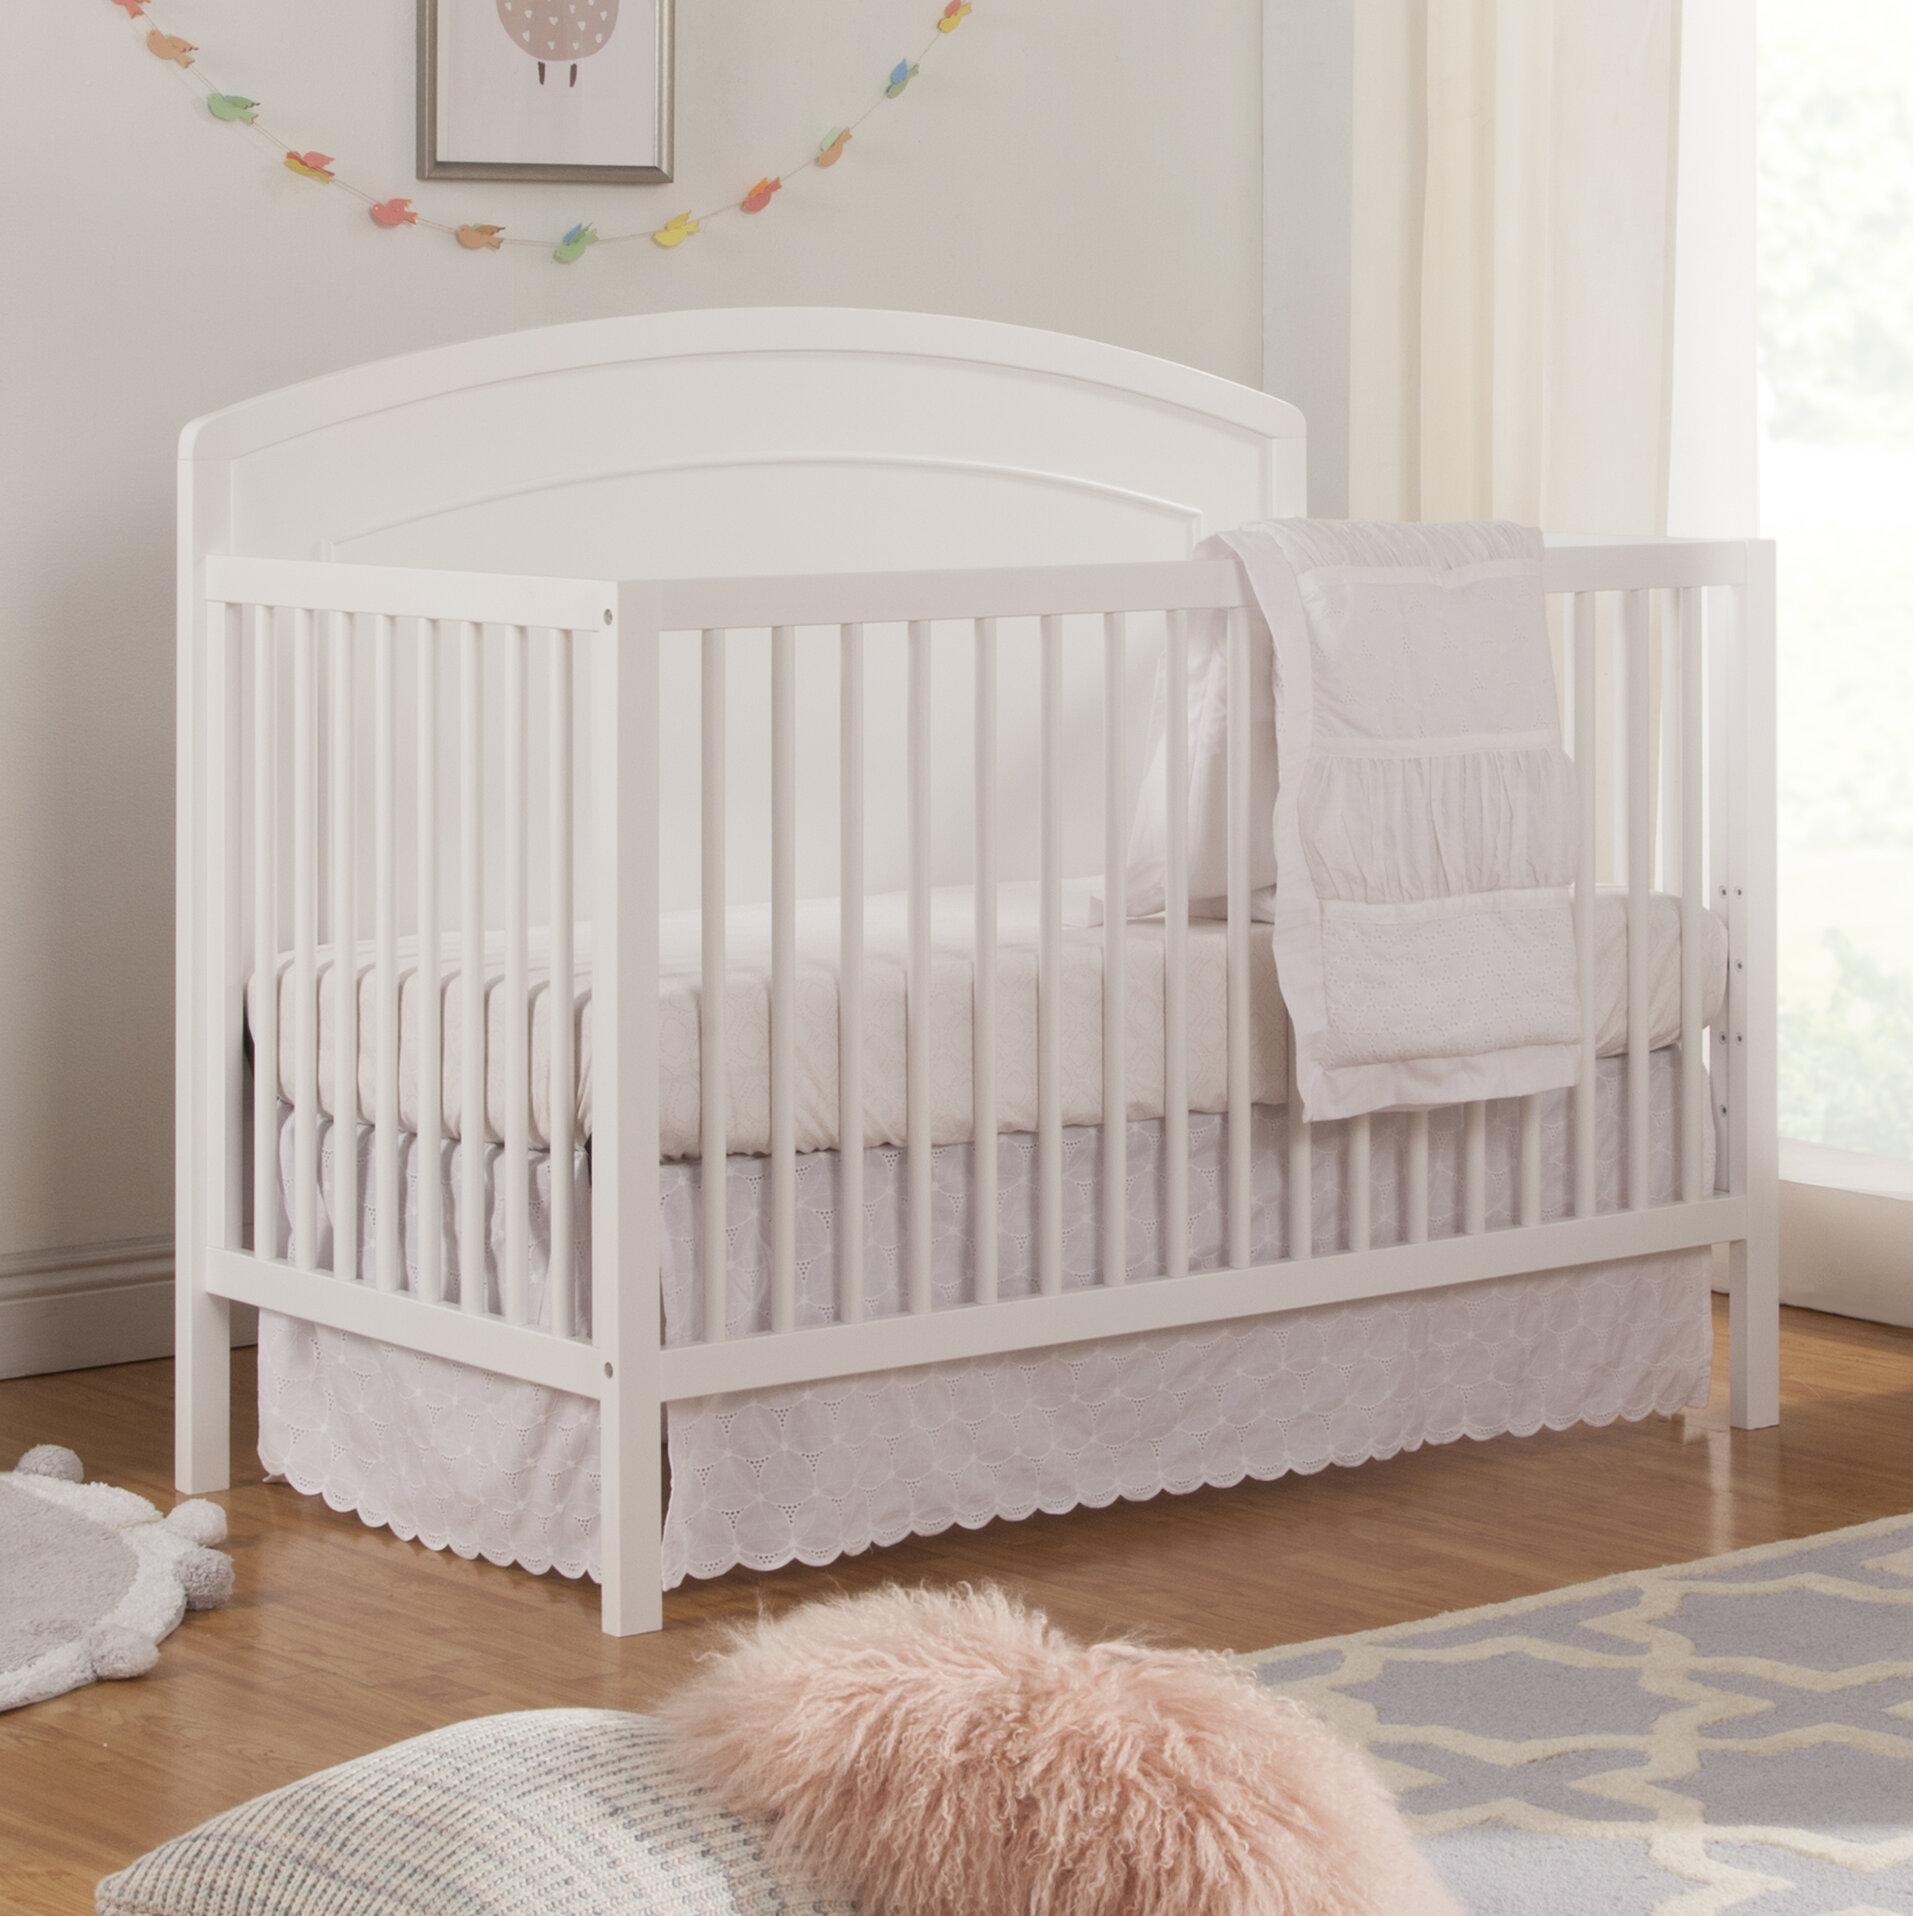 Carters By Davinci Kenzie 4 In 1 Convertible Crib & Reviews -